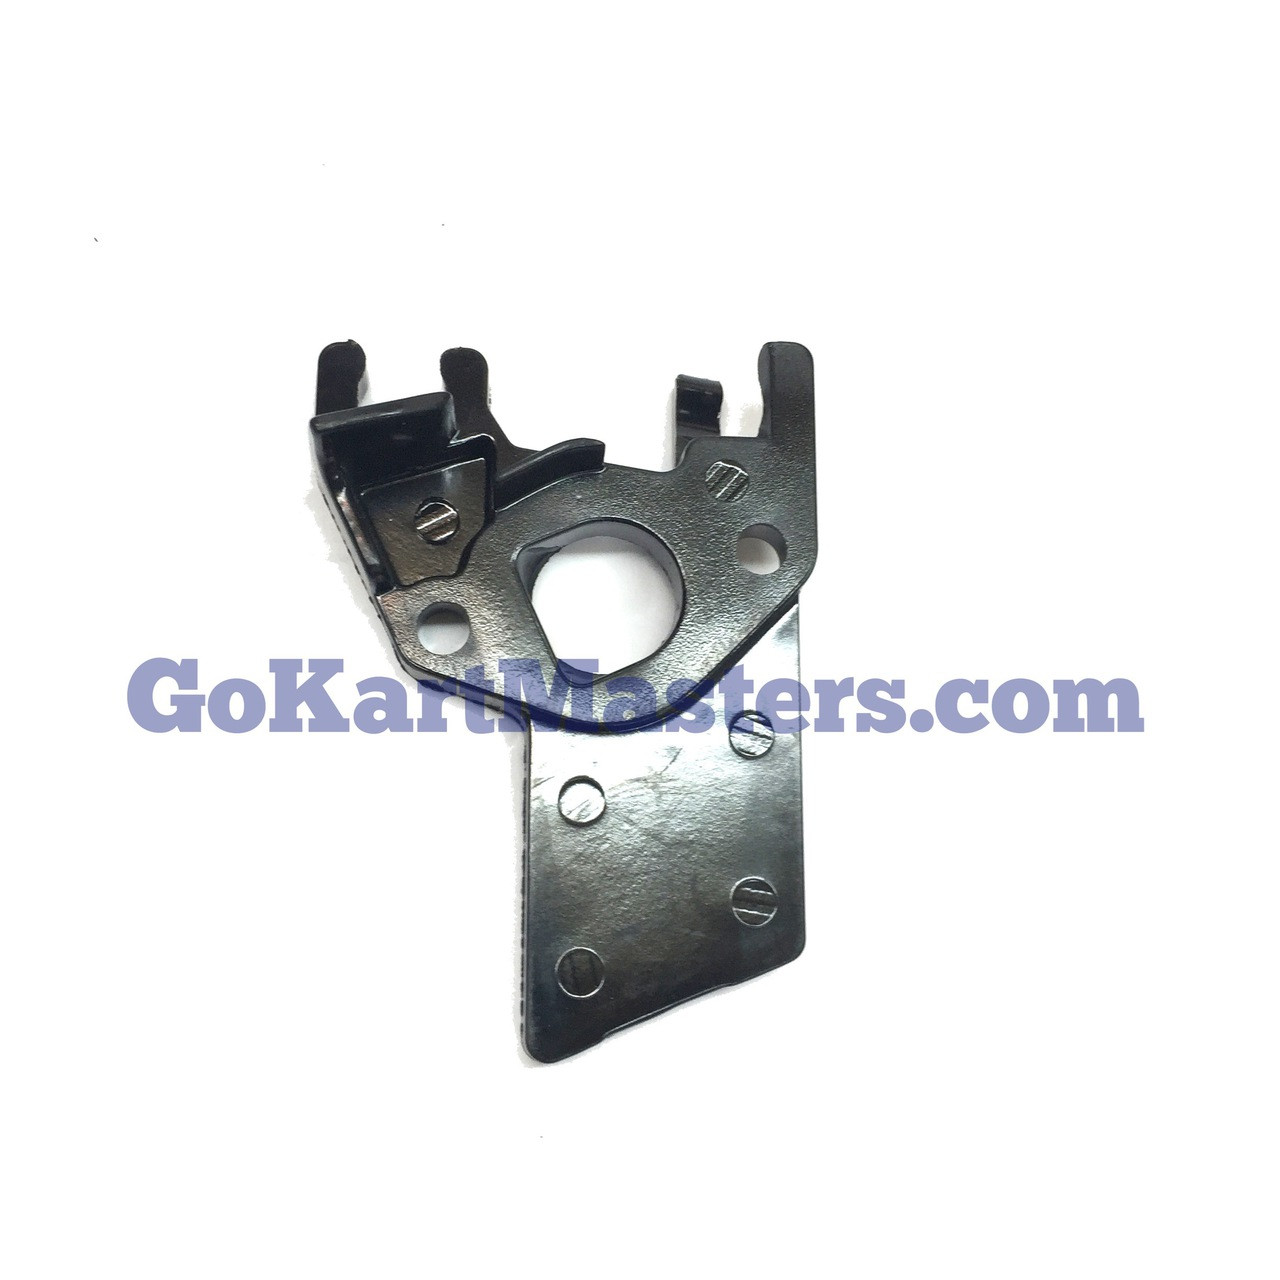 TrailMaster Mini XRX-R Carburetor Gasket/Insulator Set